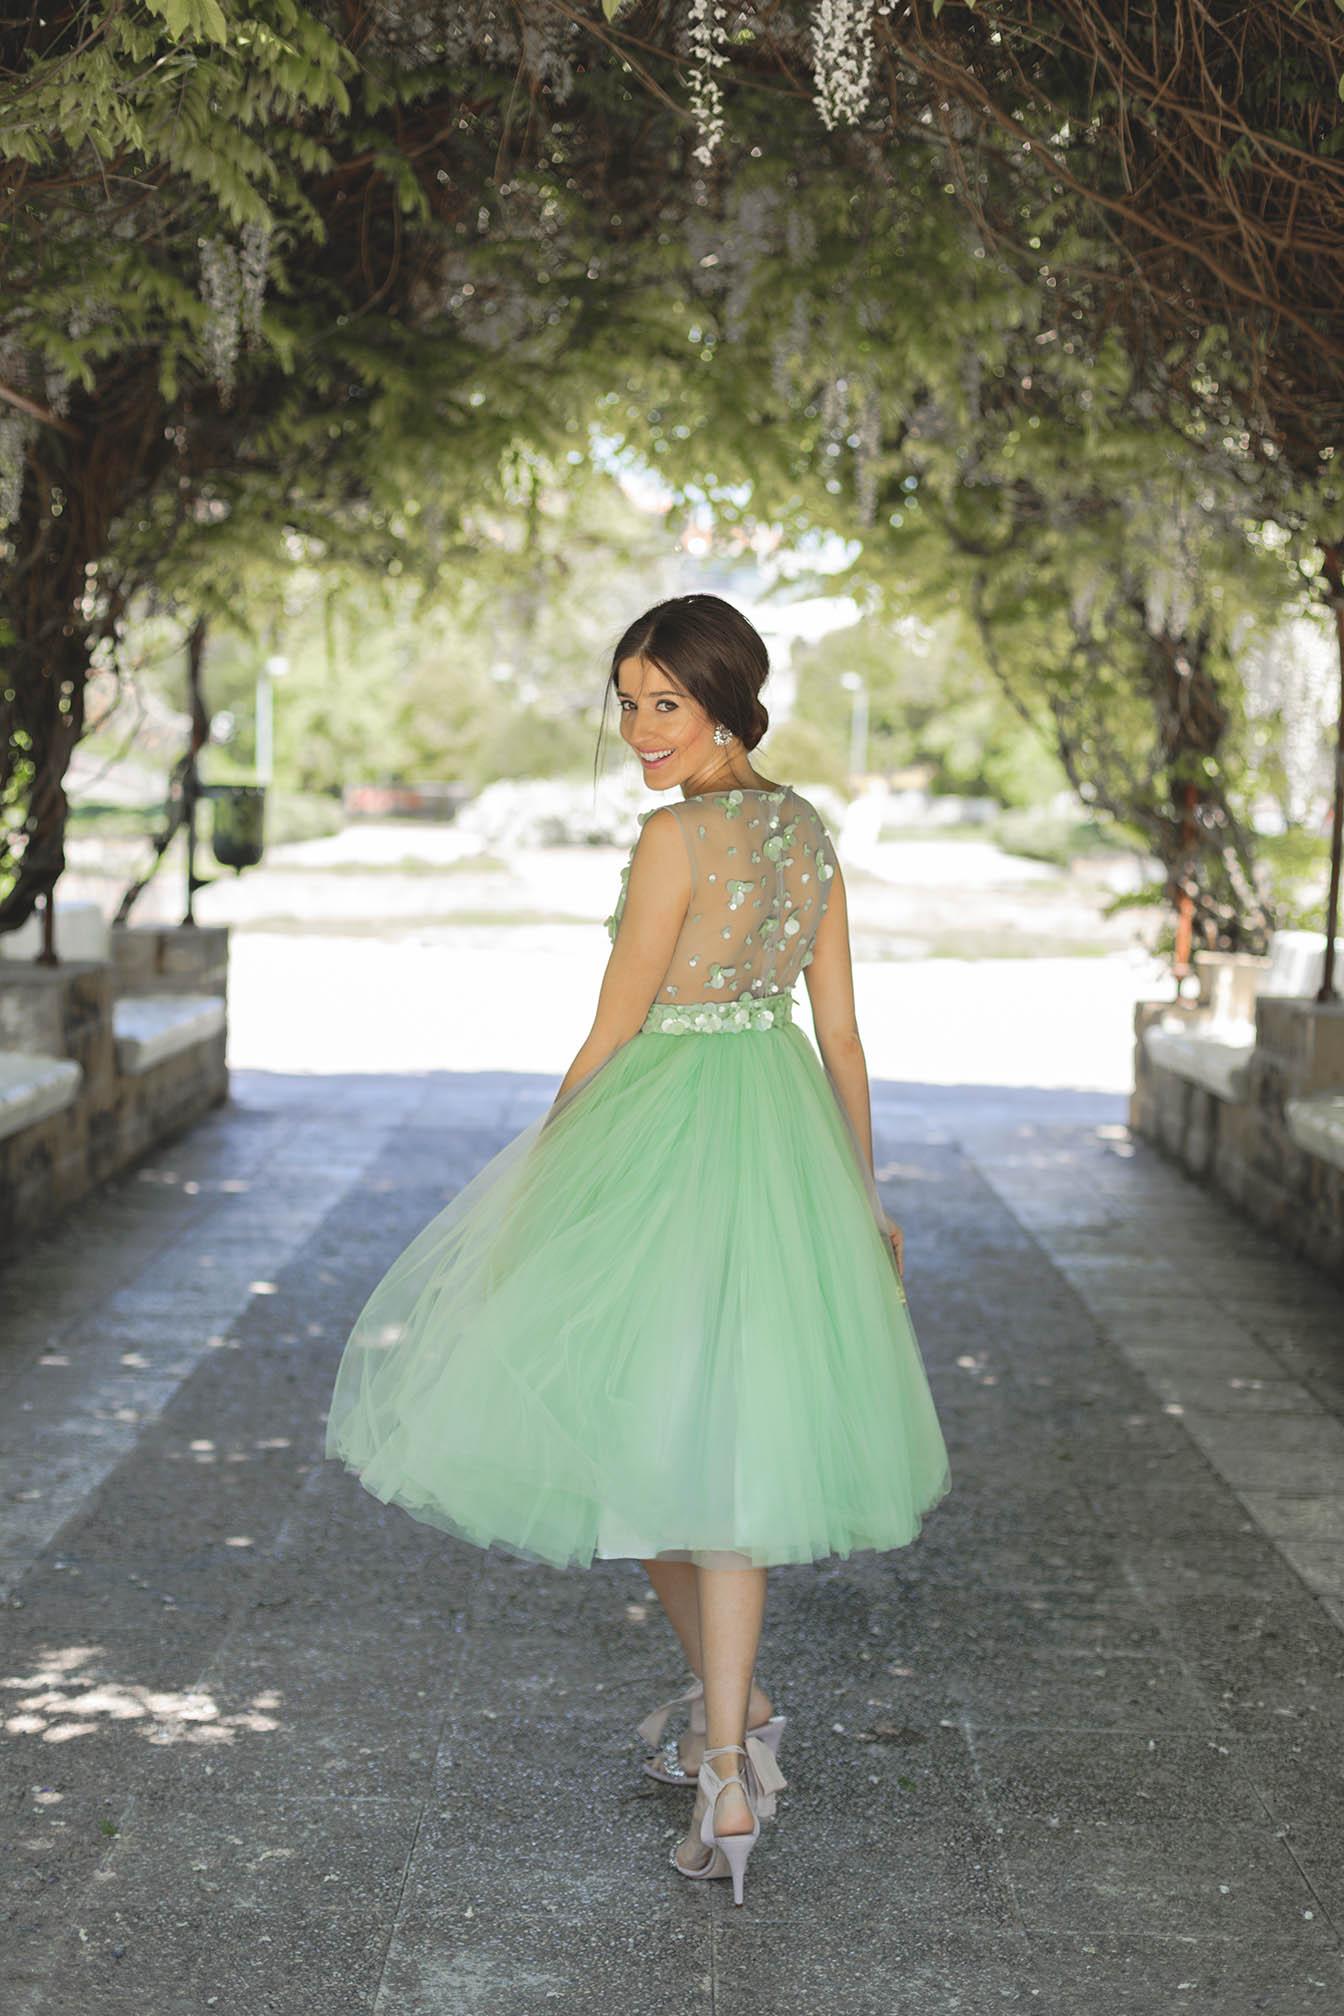 Invitada perfecta 2018 falda vestido tul boda bgo me vestido fiesta mint hermana novia